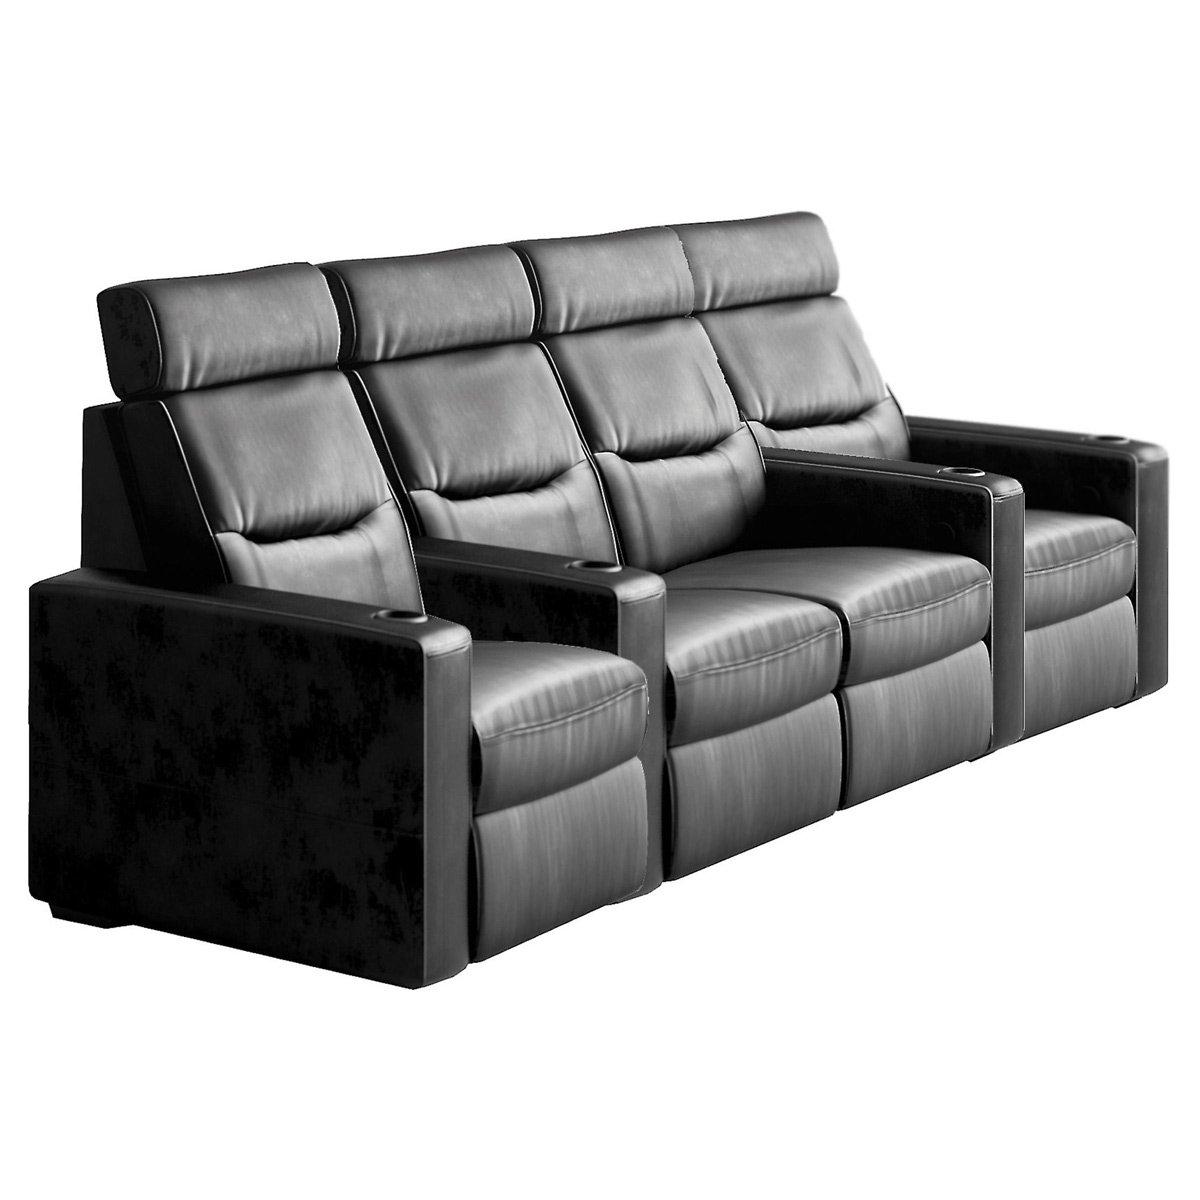 Salamander TC3 AV Basics 4-Seat with Loveseat Straight Motorized Recliner Home Theater Seating (Black Bonded Leather)